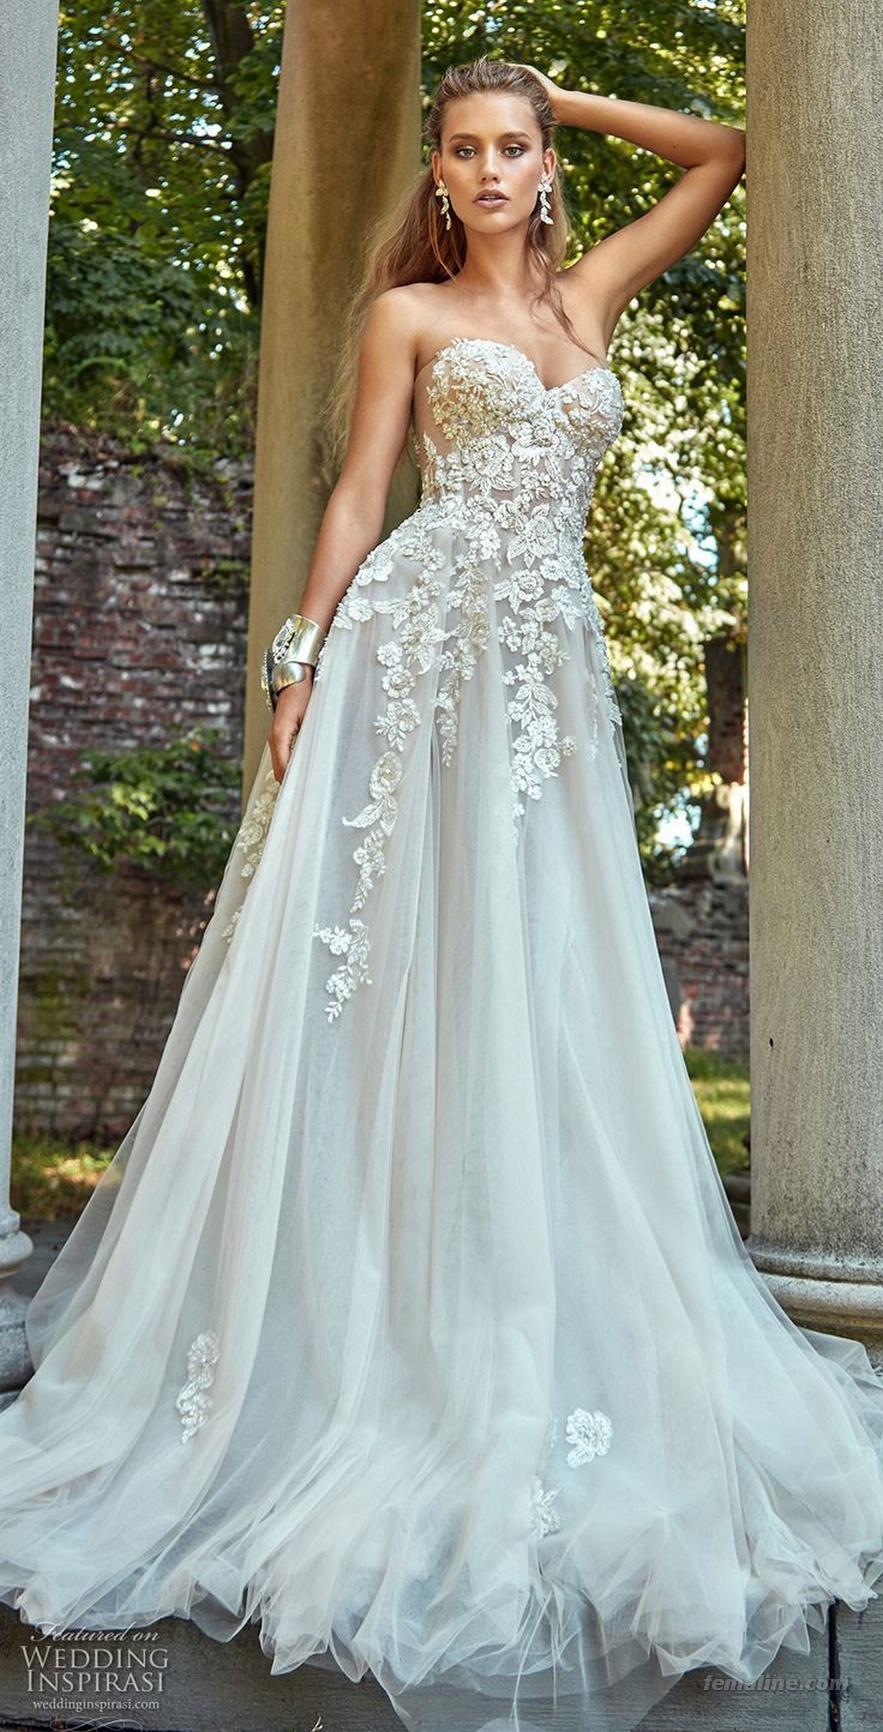 wedding dresses catalogs photo - 1